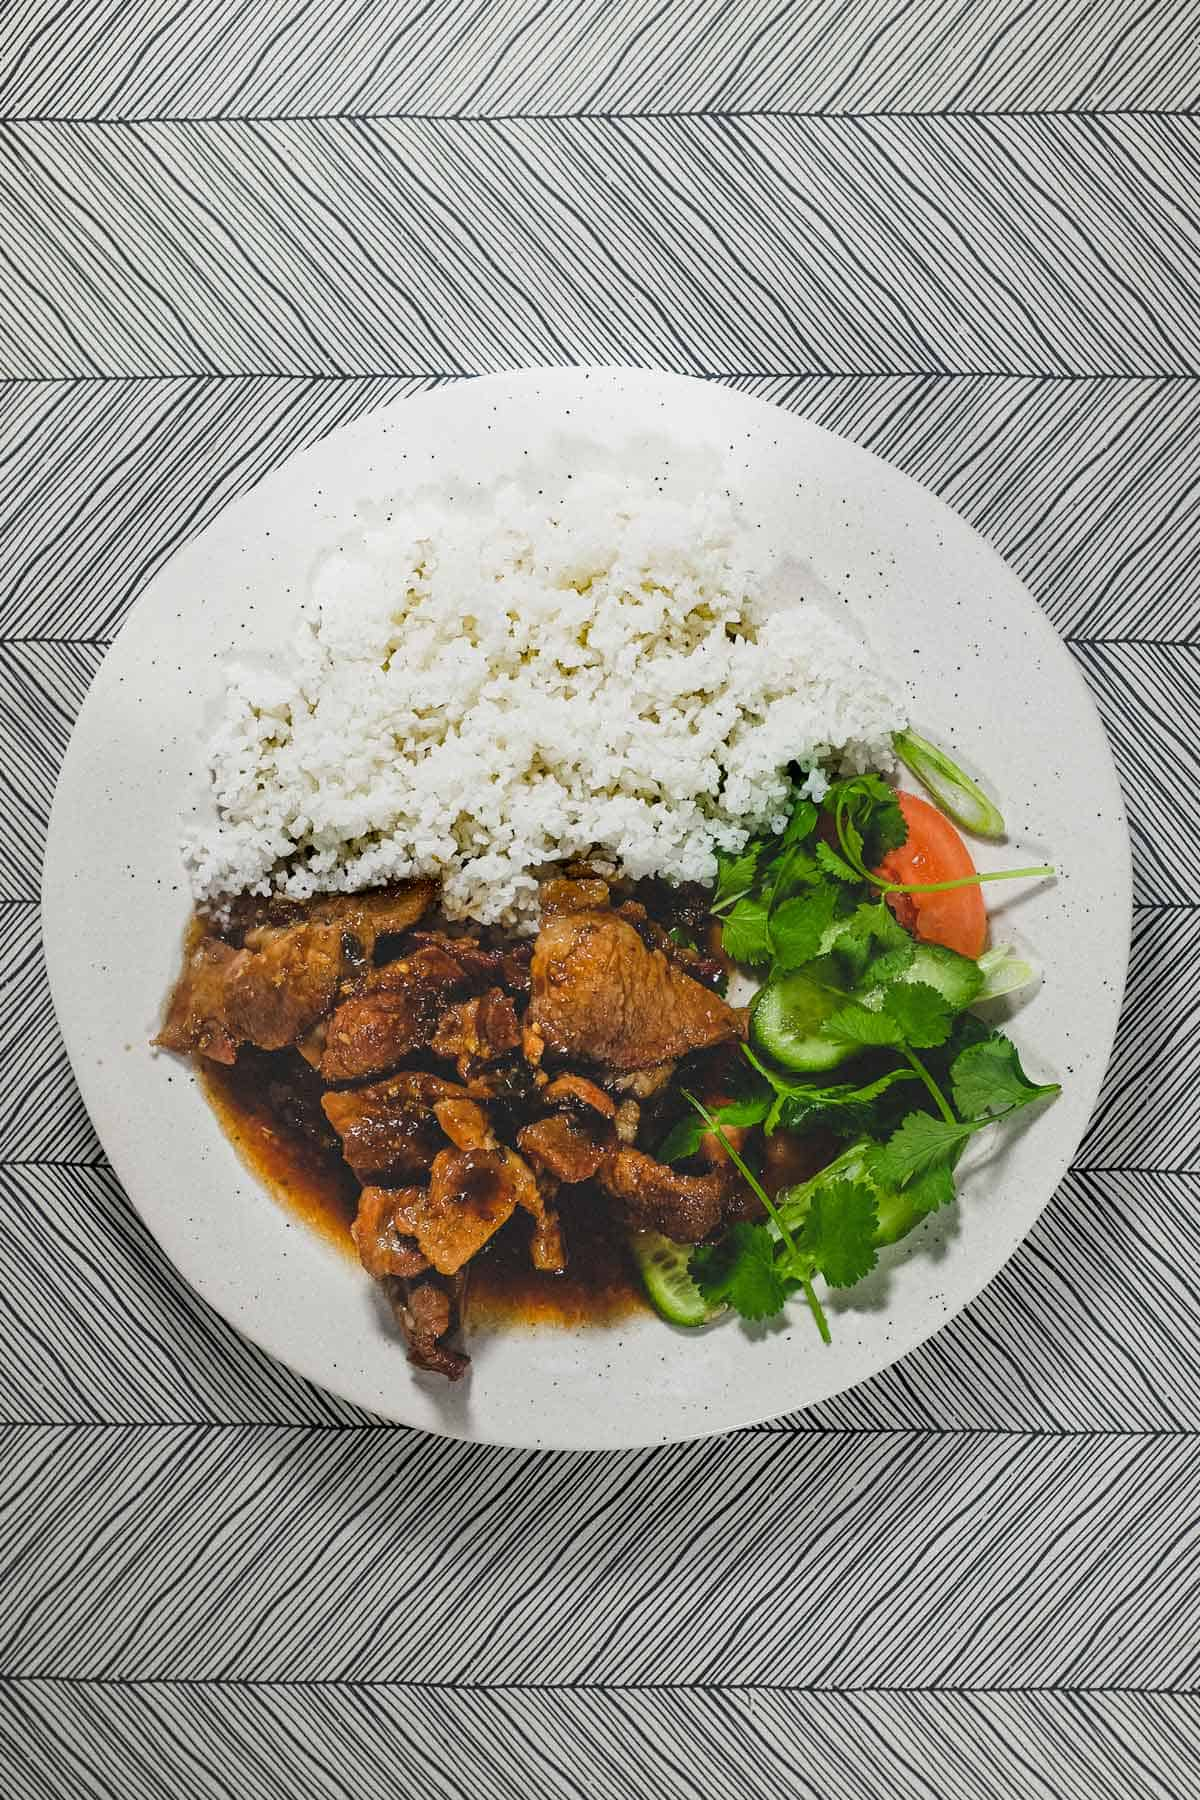 Vietnamese Pork with Lemongrass & Chilli